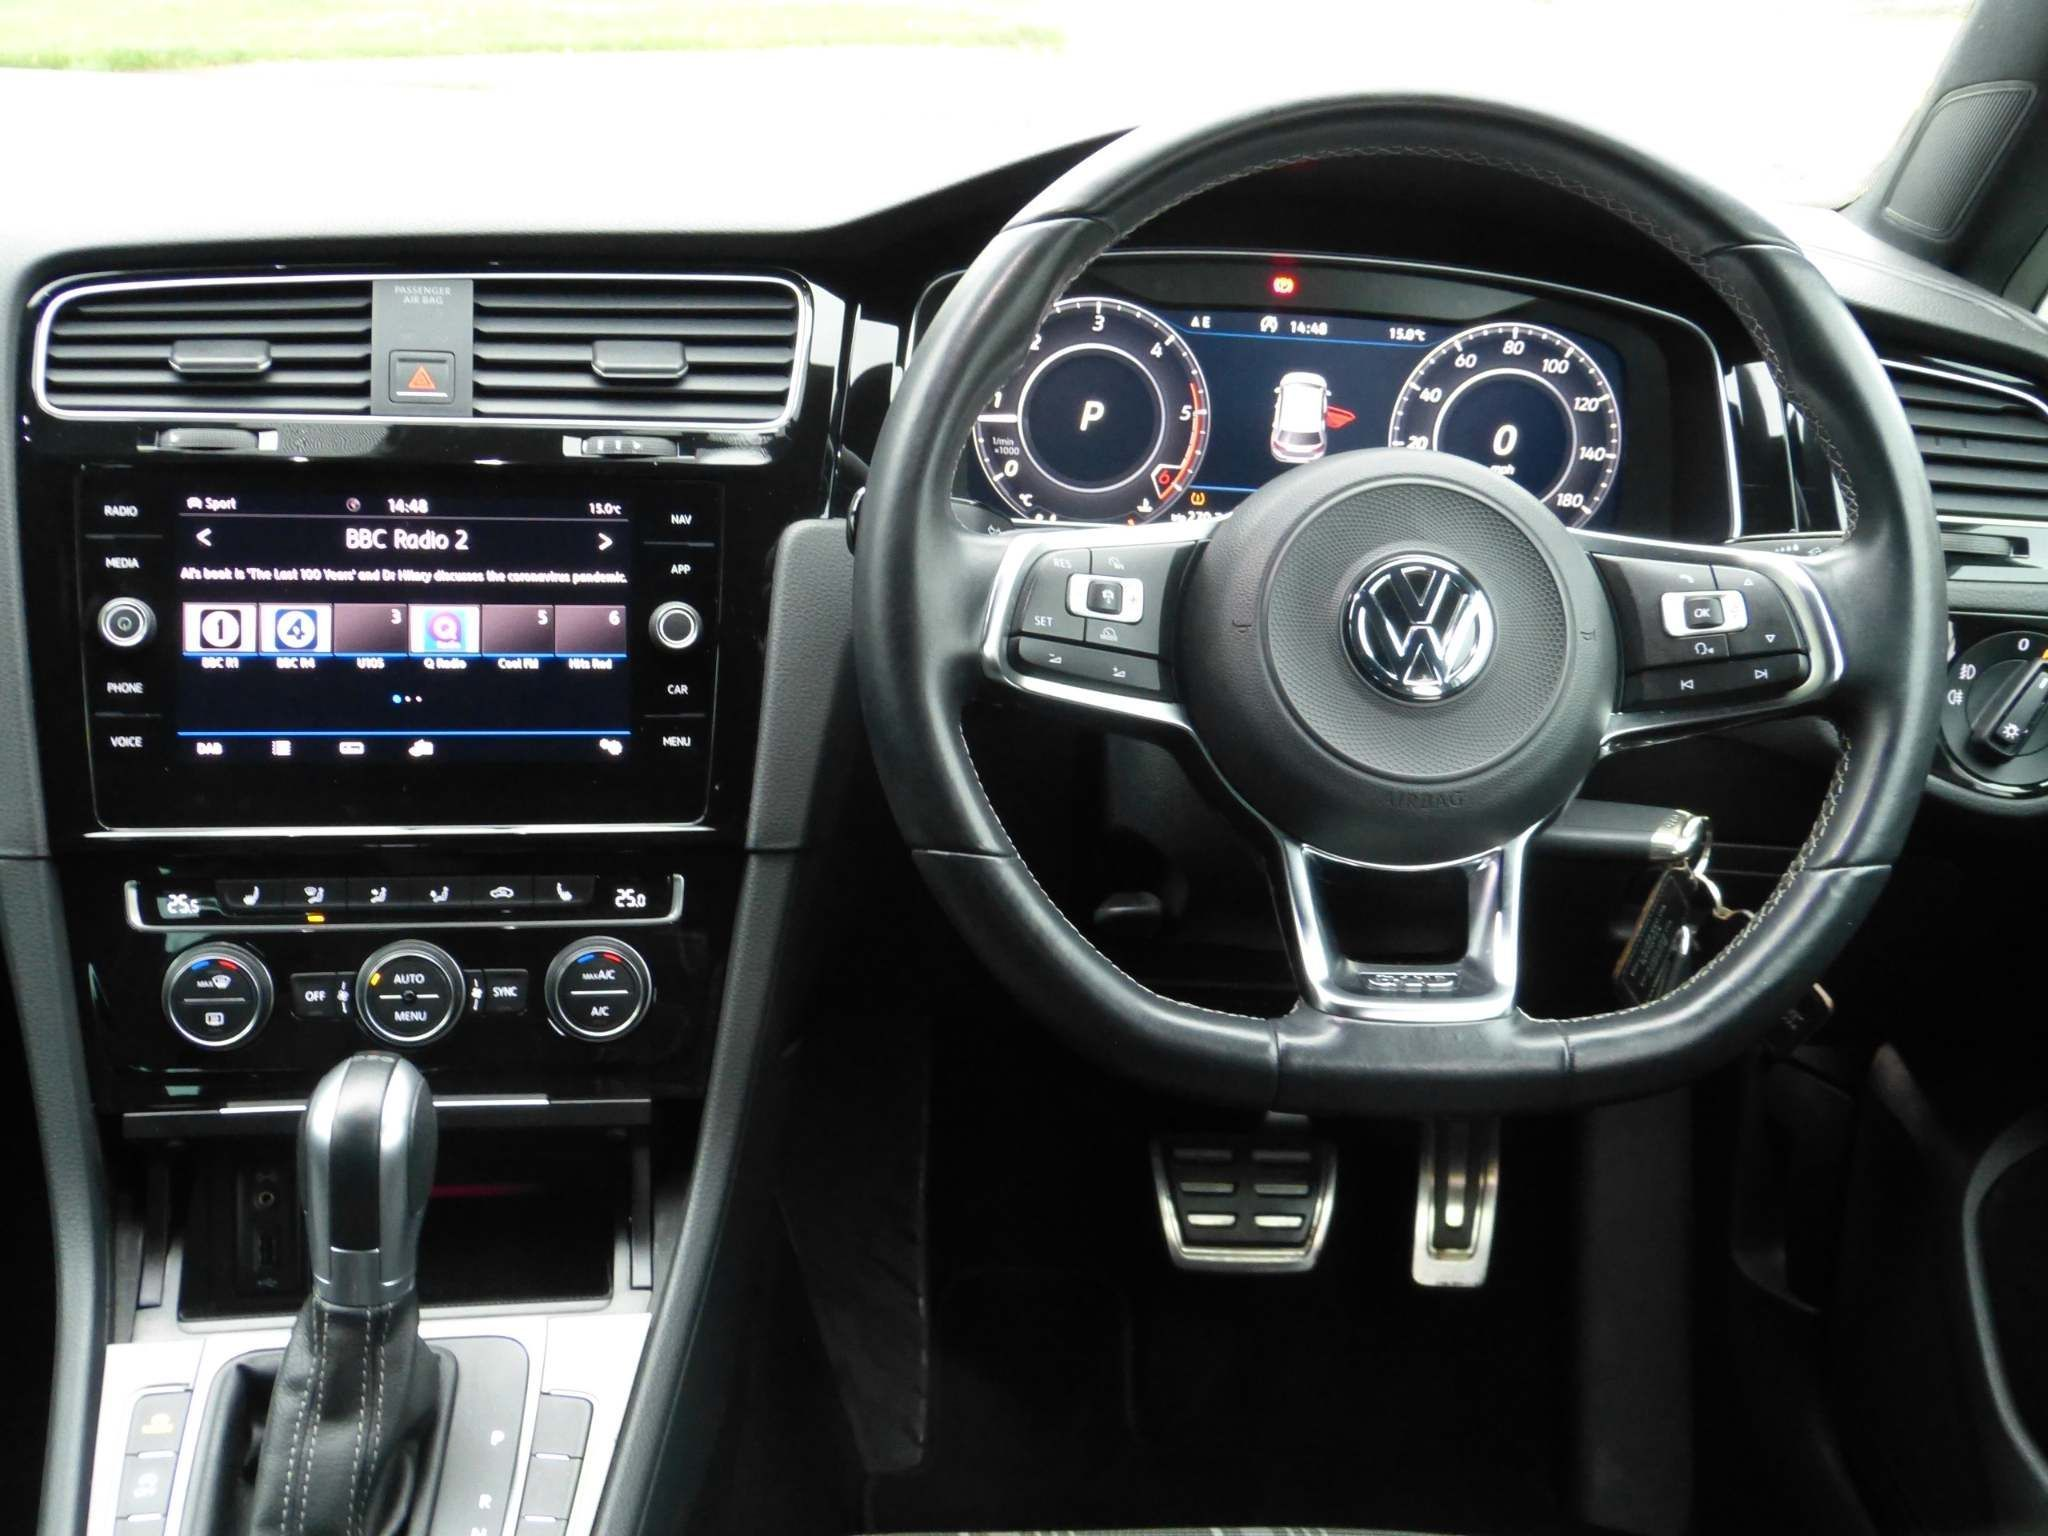 2018 VOLKSWAGEN Golf 2.0 TDI GTD DSG (s/s) Diesel Automatic excellent condition – Beechlawn Motors Belfast full